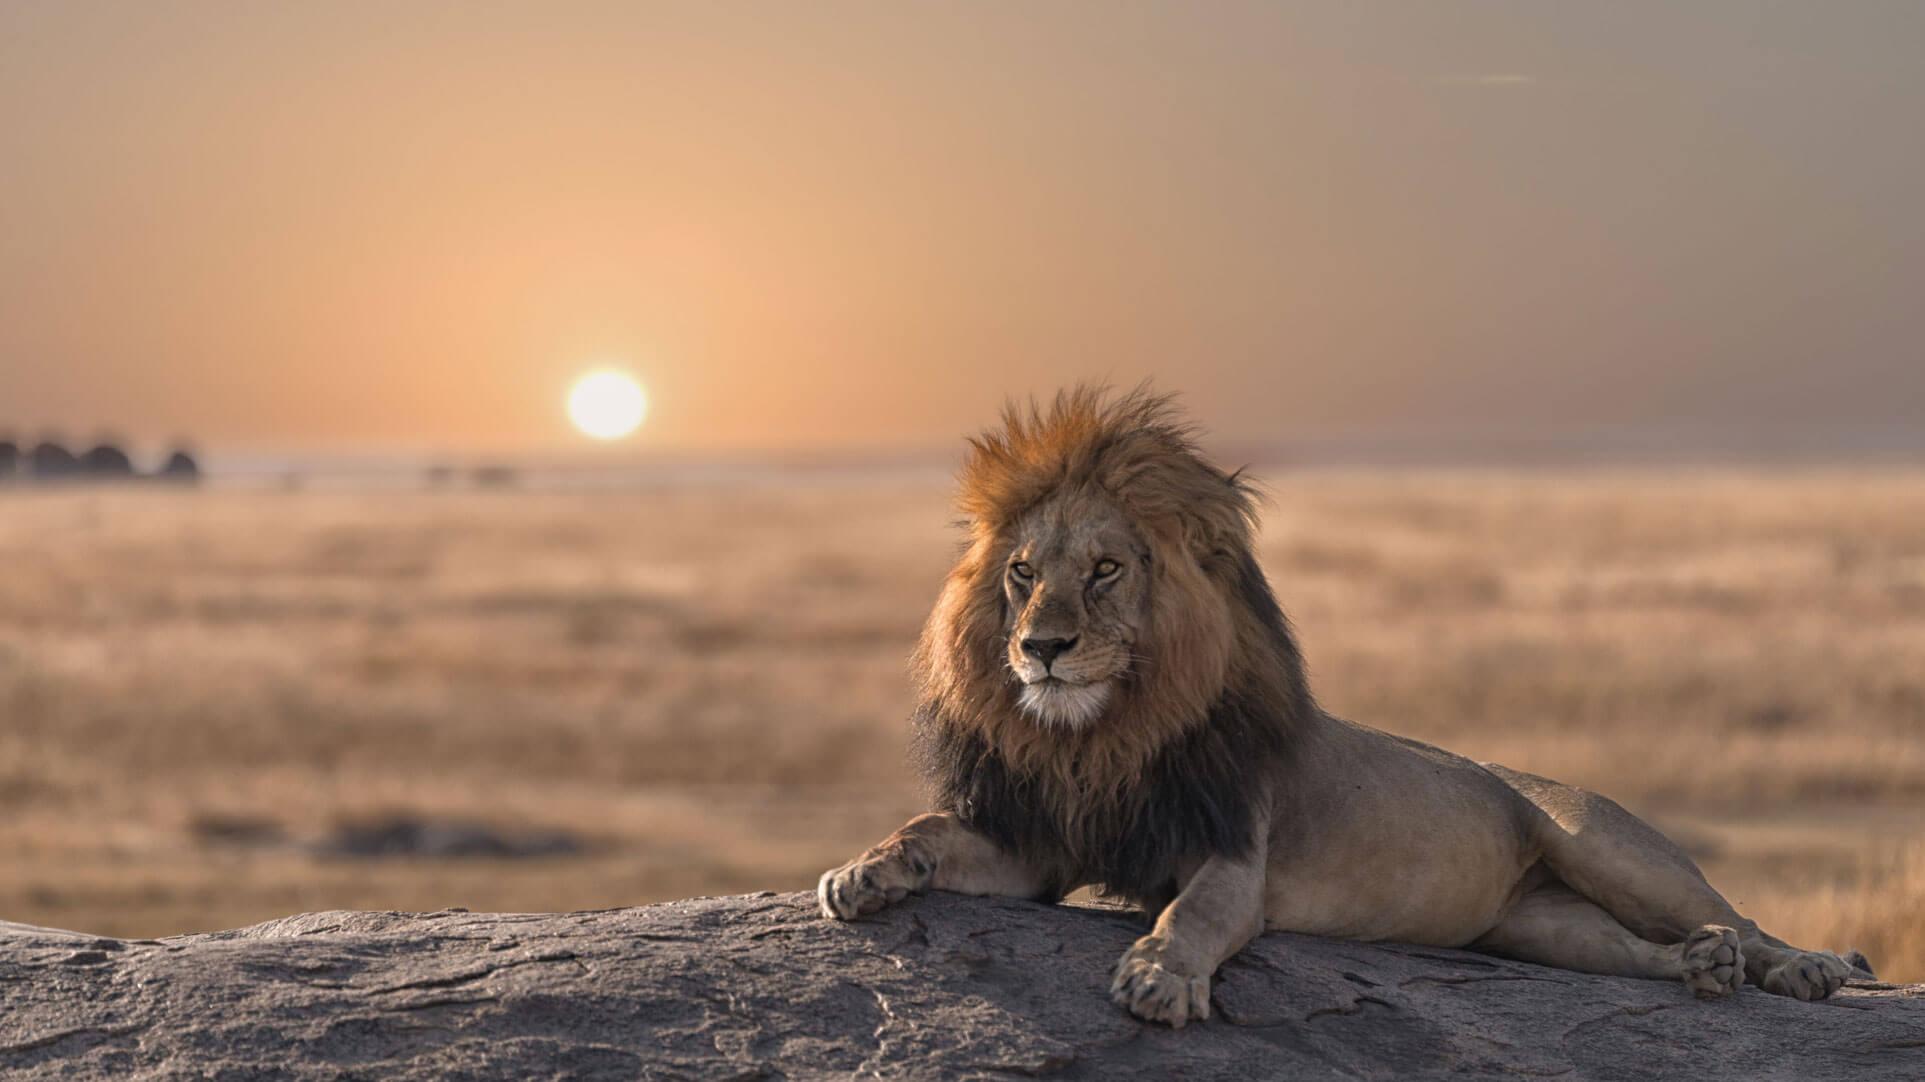 Lion safari africa sunset